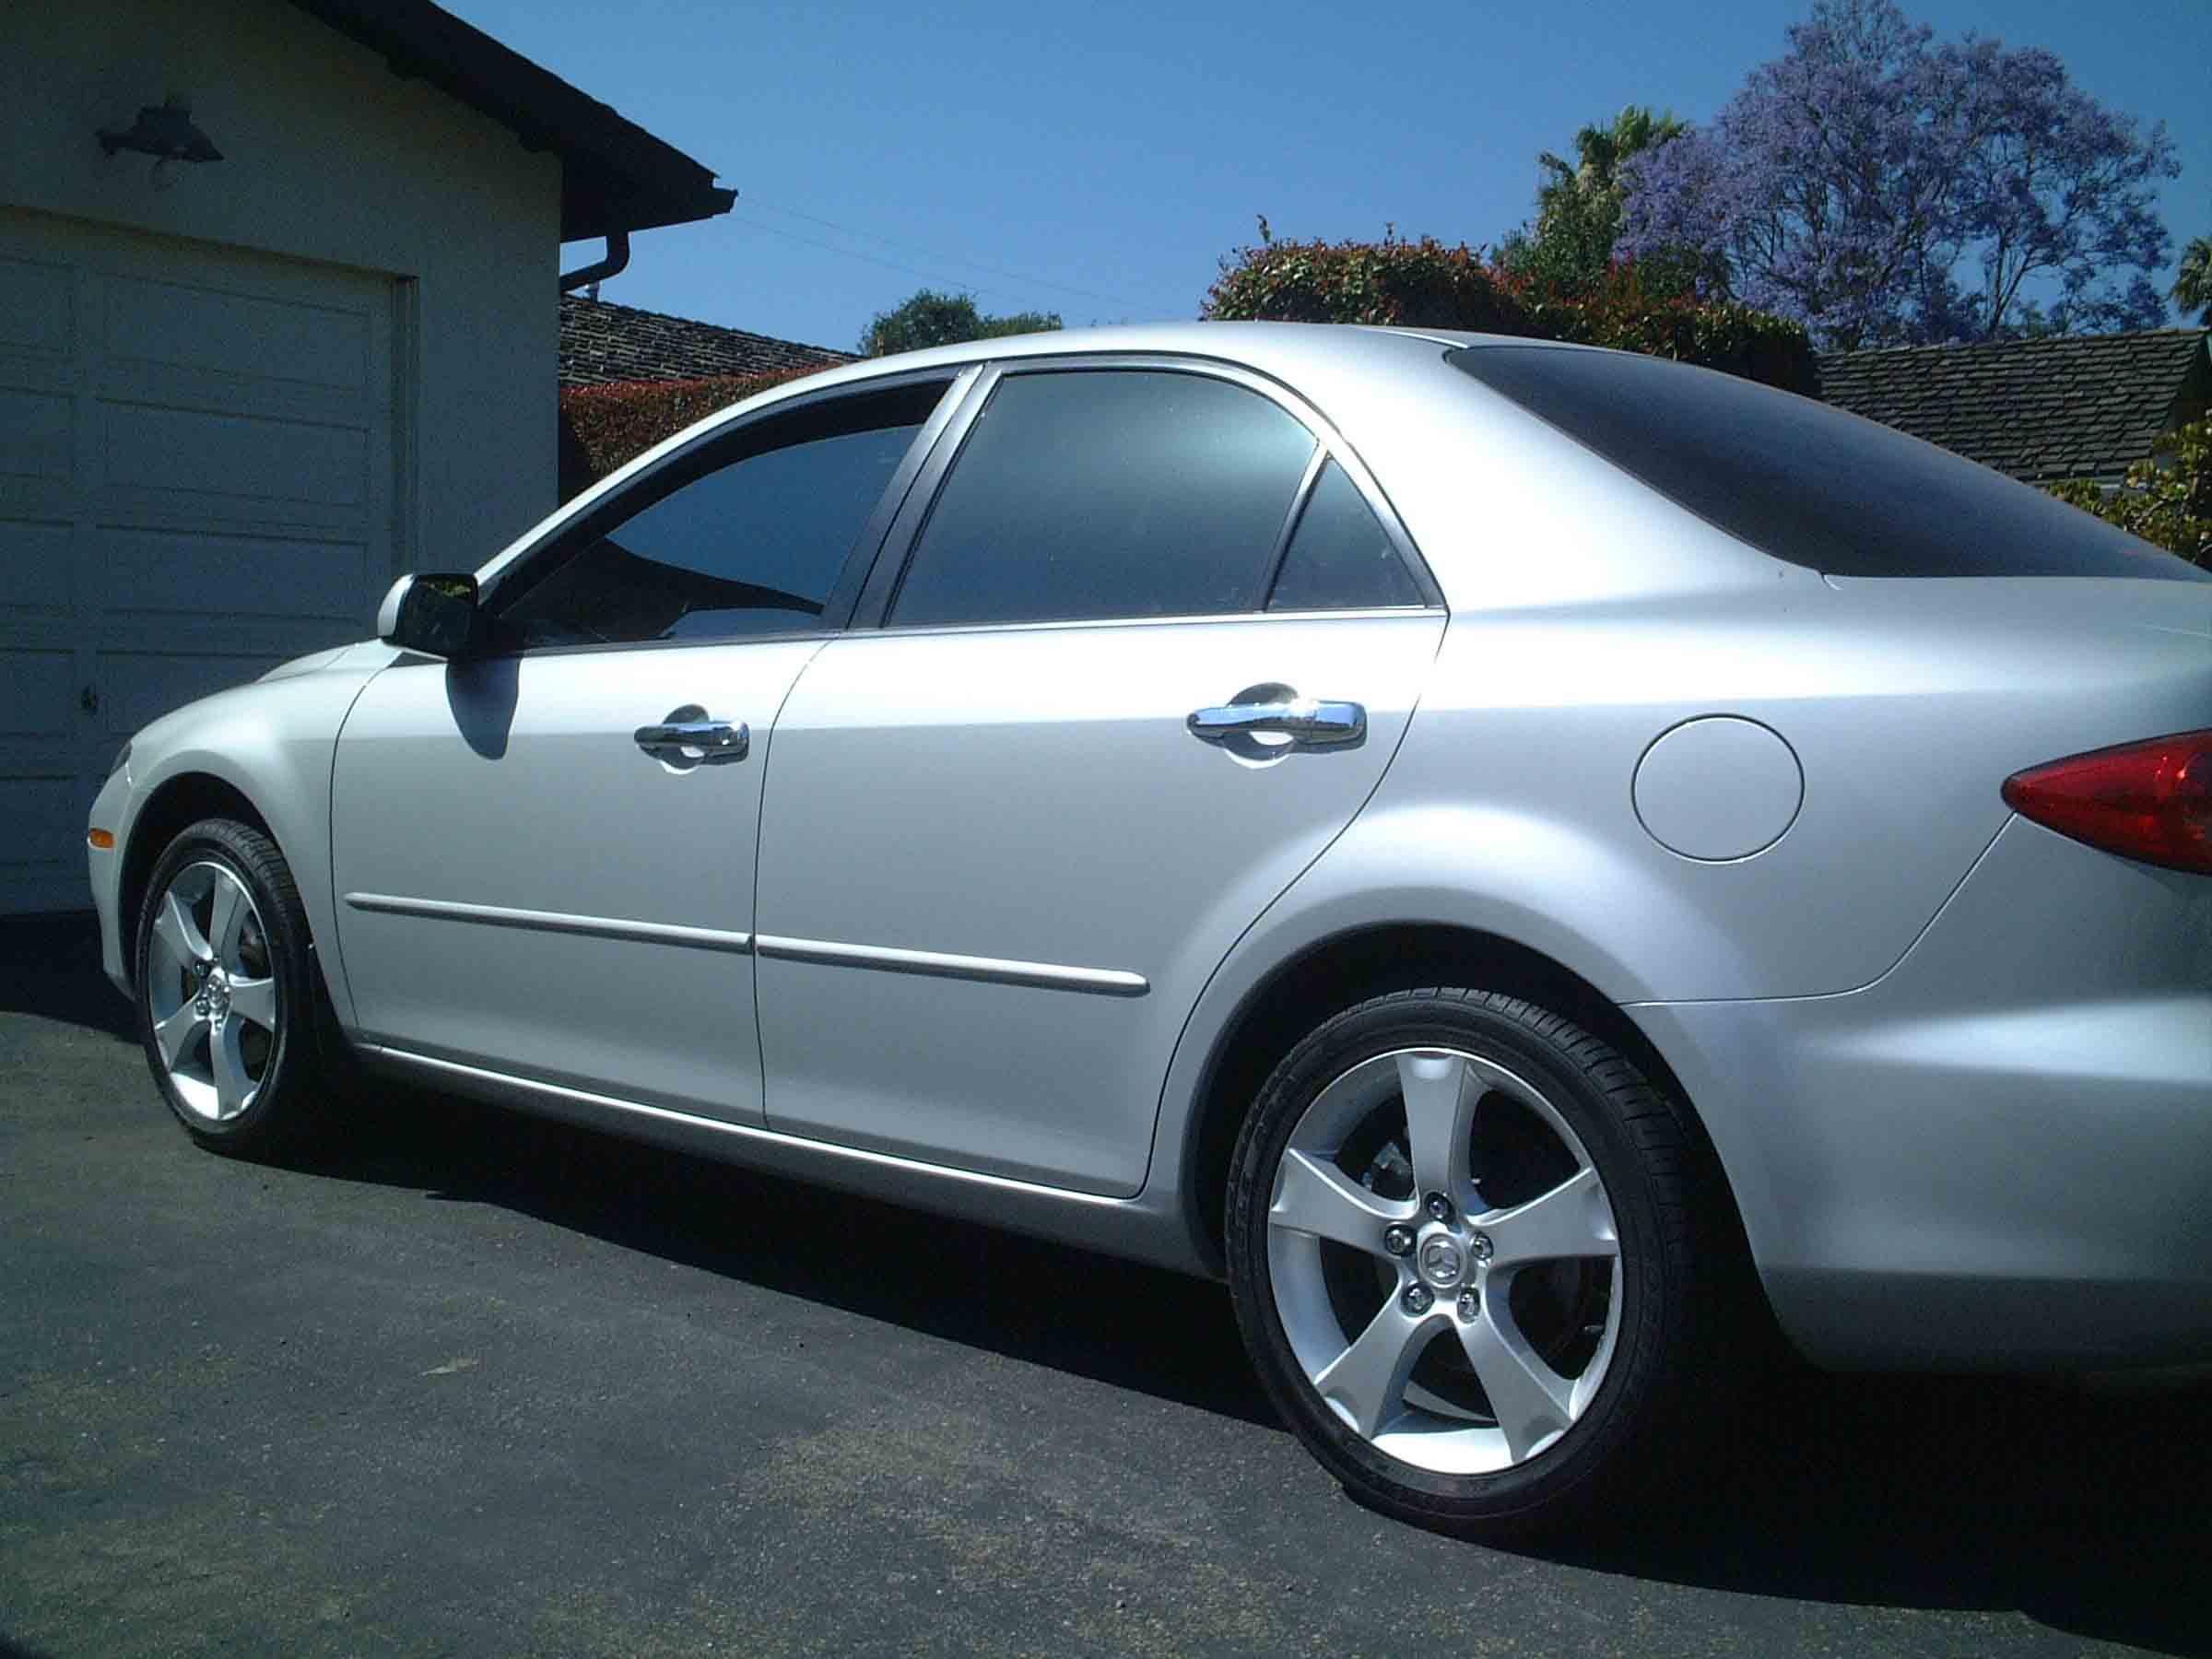 Mazda 3 Wheels on a 6? - Mazda 6 Forums : Mazda 6 Forum / Mazda ...